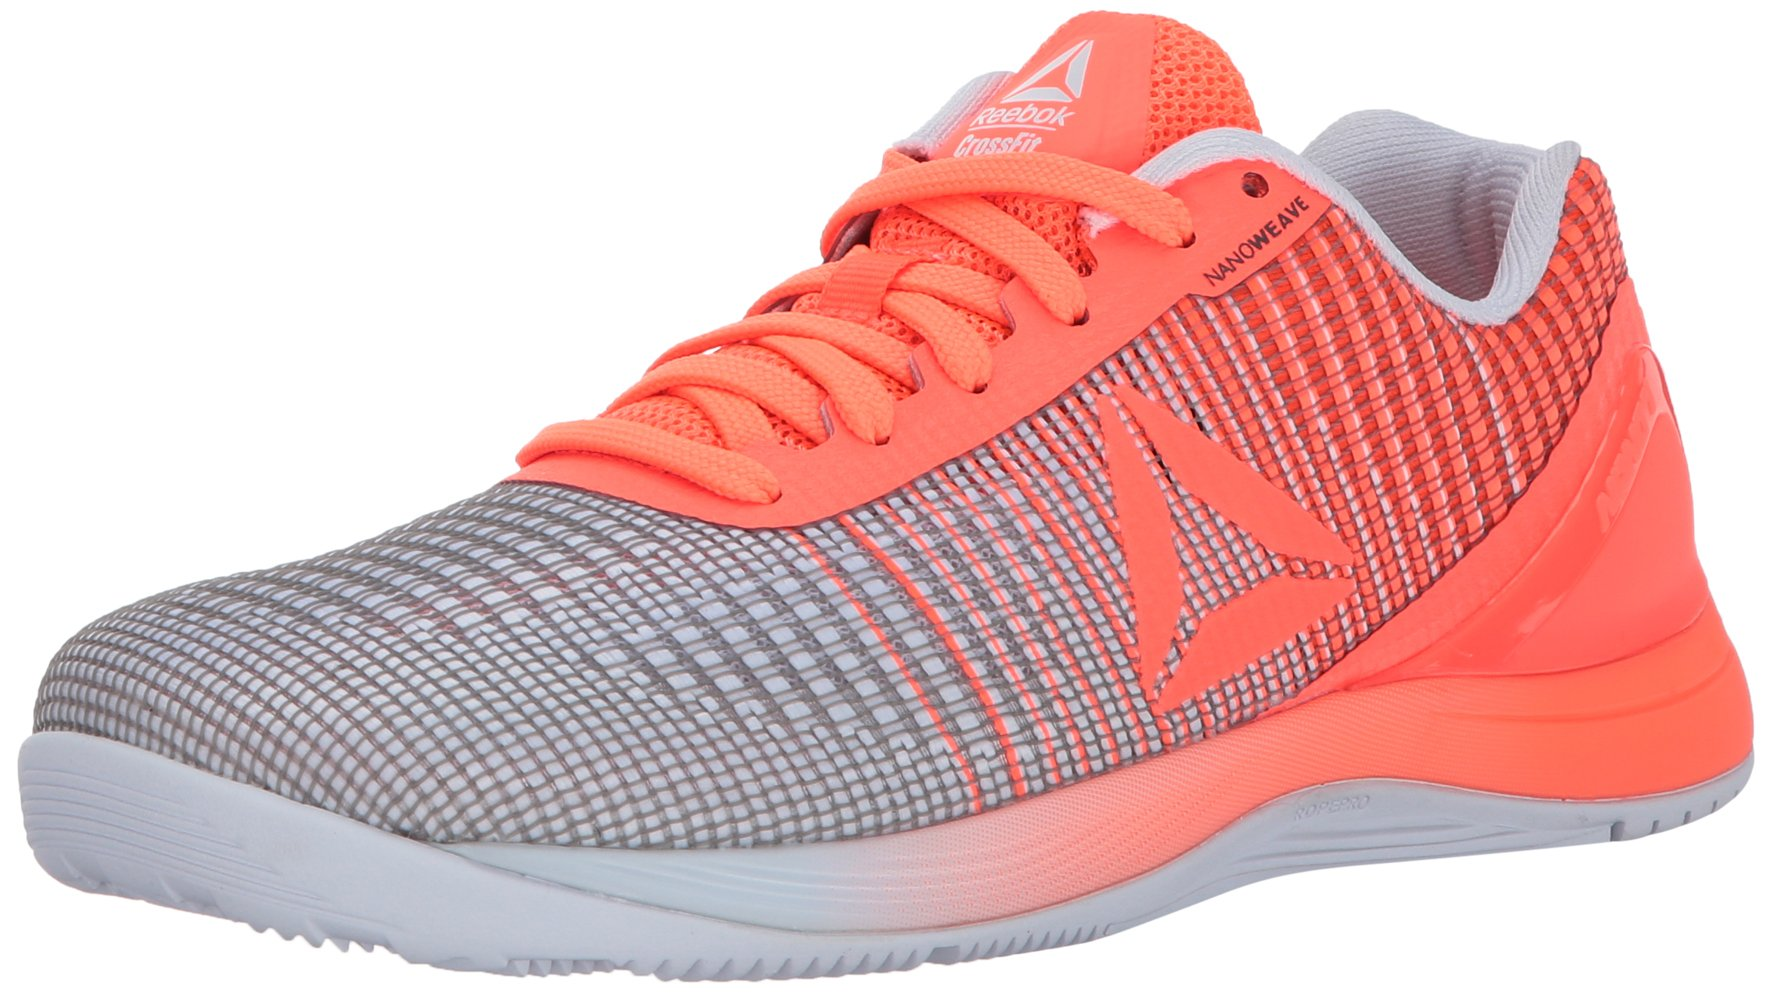 Reebok Women's Crossfit Nano 7.0 Track Shoe, Guava Punch/White, 11 M US